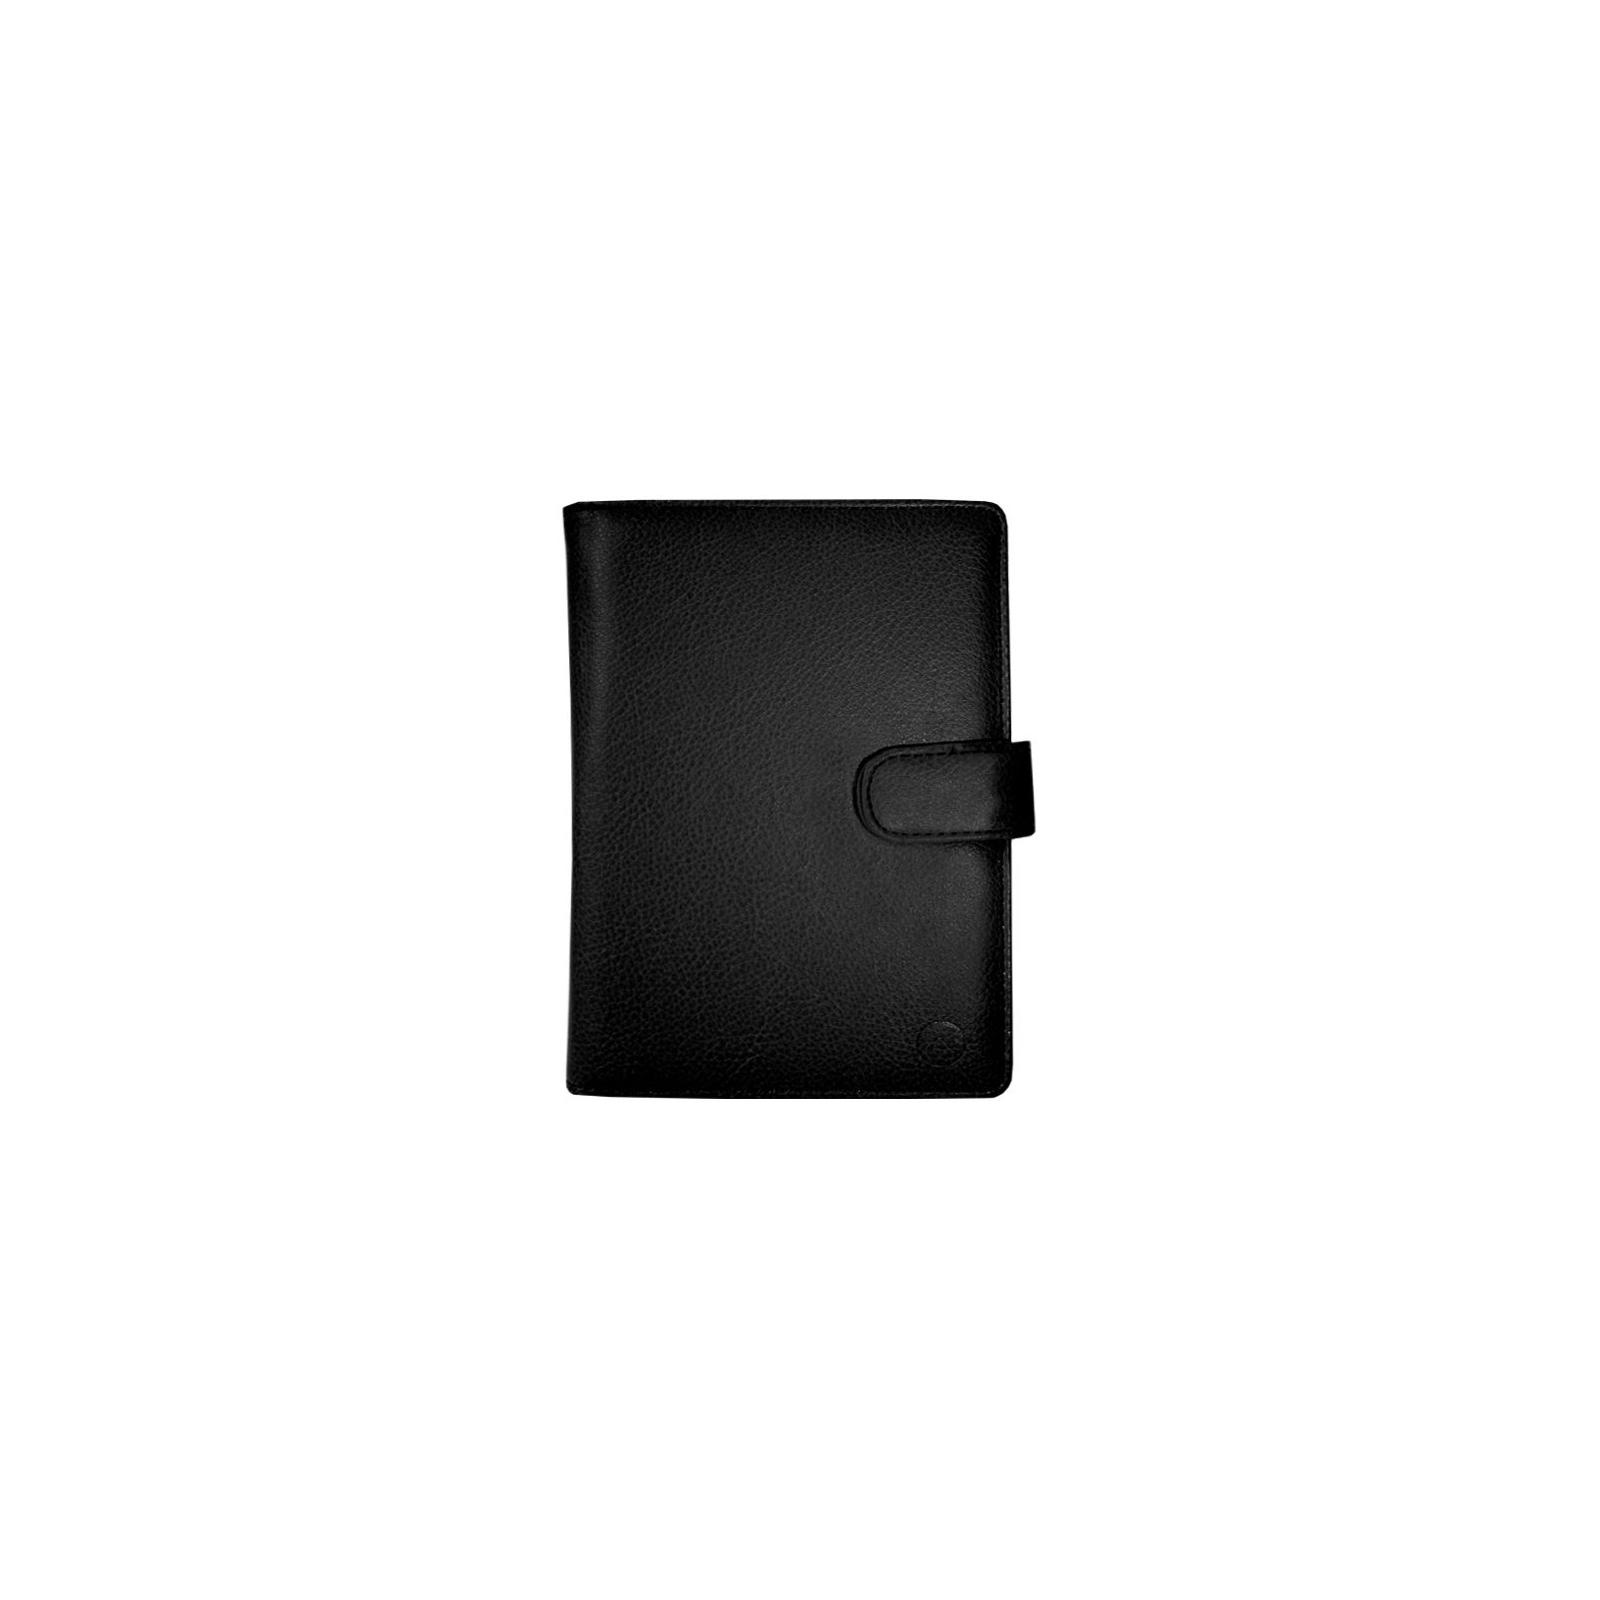 Чехол для электронной книги AirOn для PocketBook 622/623 Touch (black) (6946795880011)